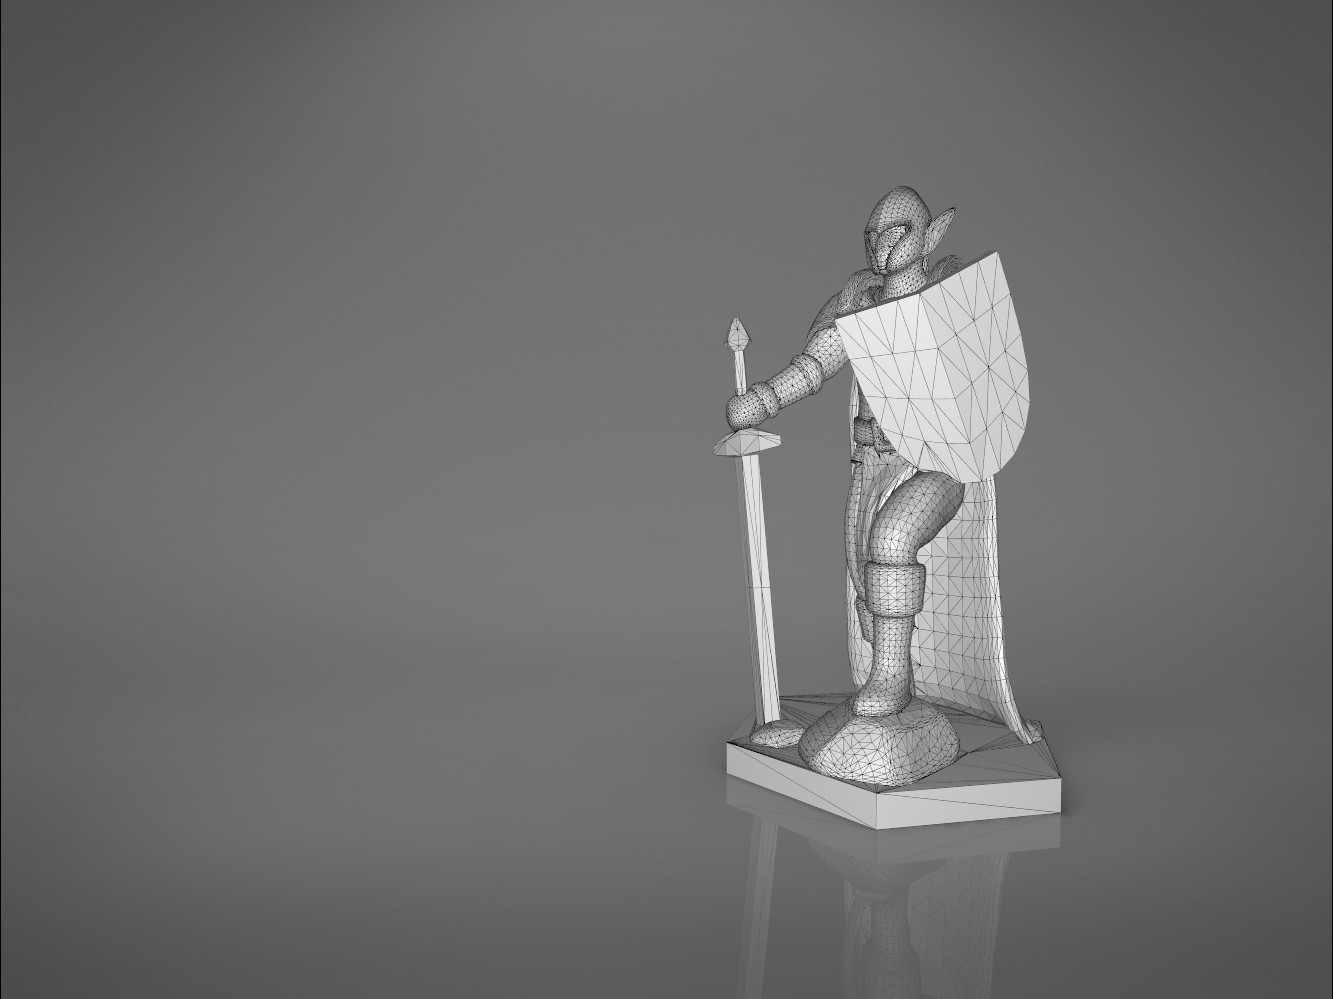 Warrior-main_render.377.jpg Download STL file ELF WARRIOR CHARACTER GAME FIGURE 3D print model • Object to 3D print, 3D-mon